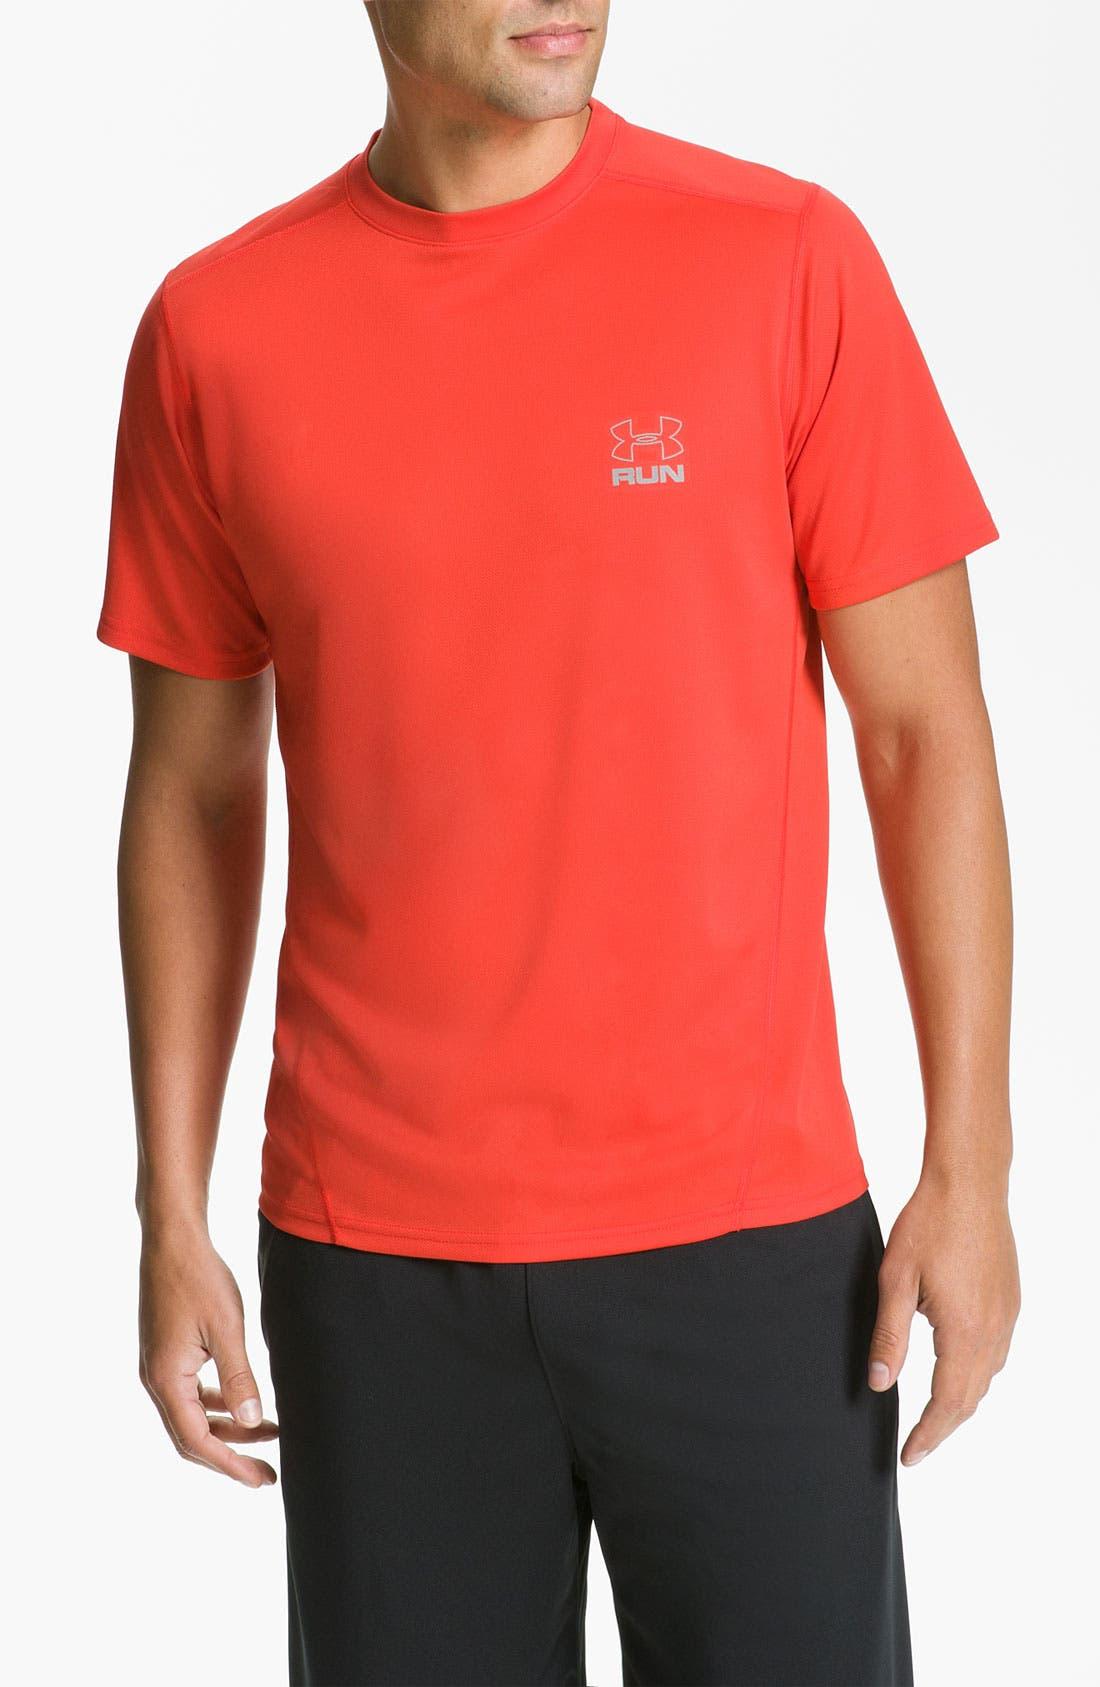 Main Image - Under Armour 'Run' HeatGear® Short Sleeve T-Shirt